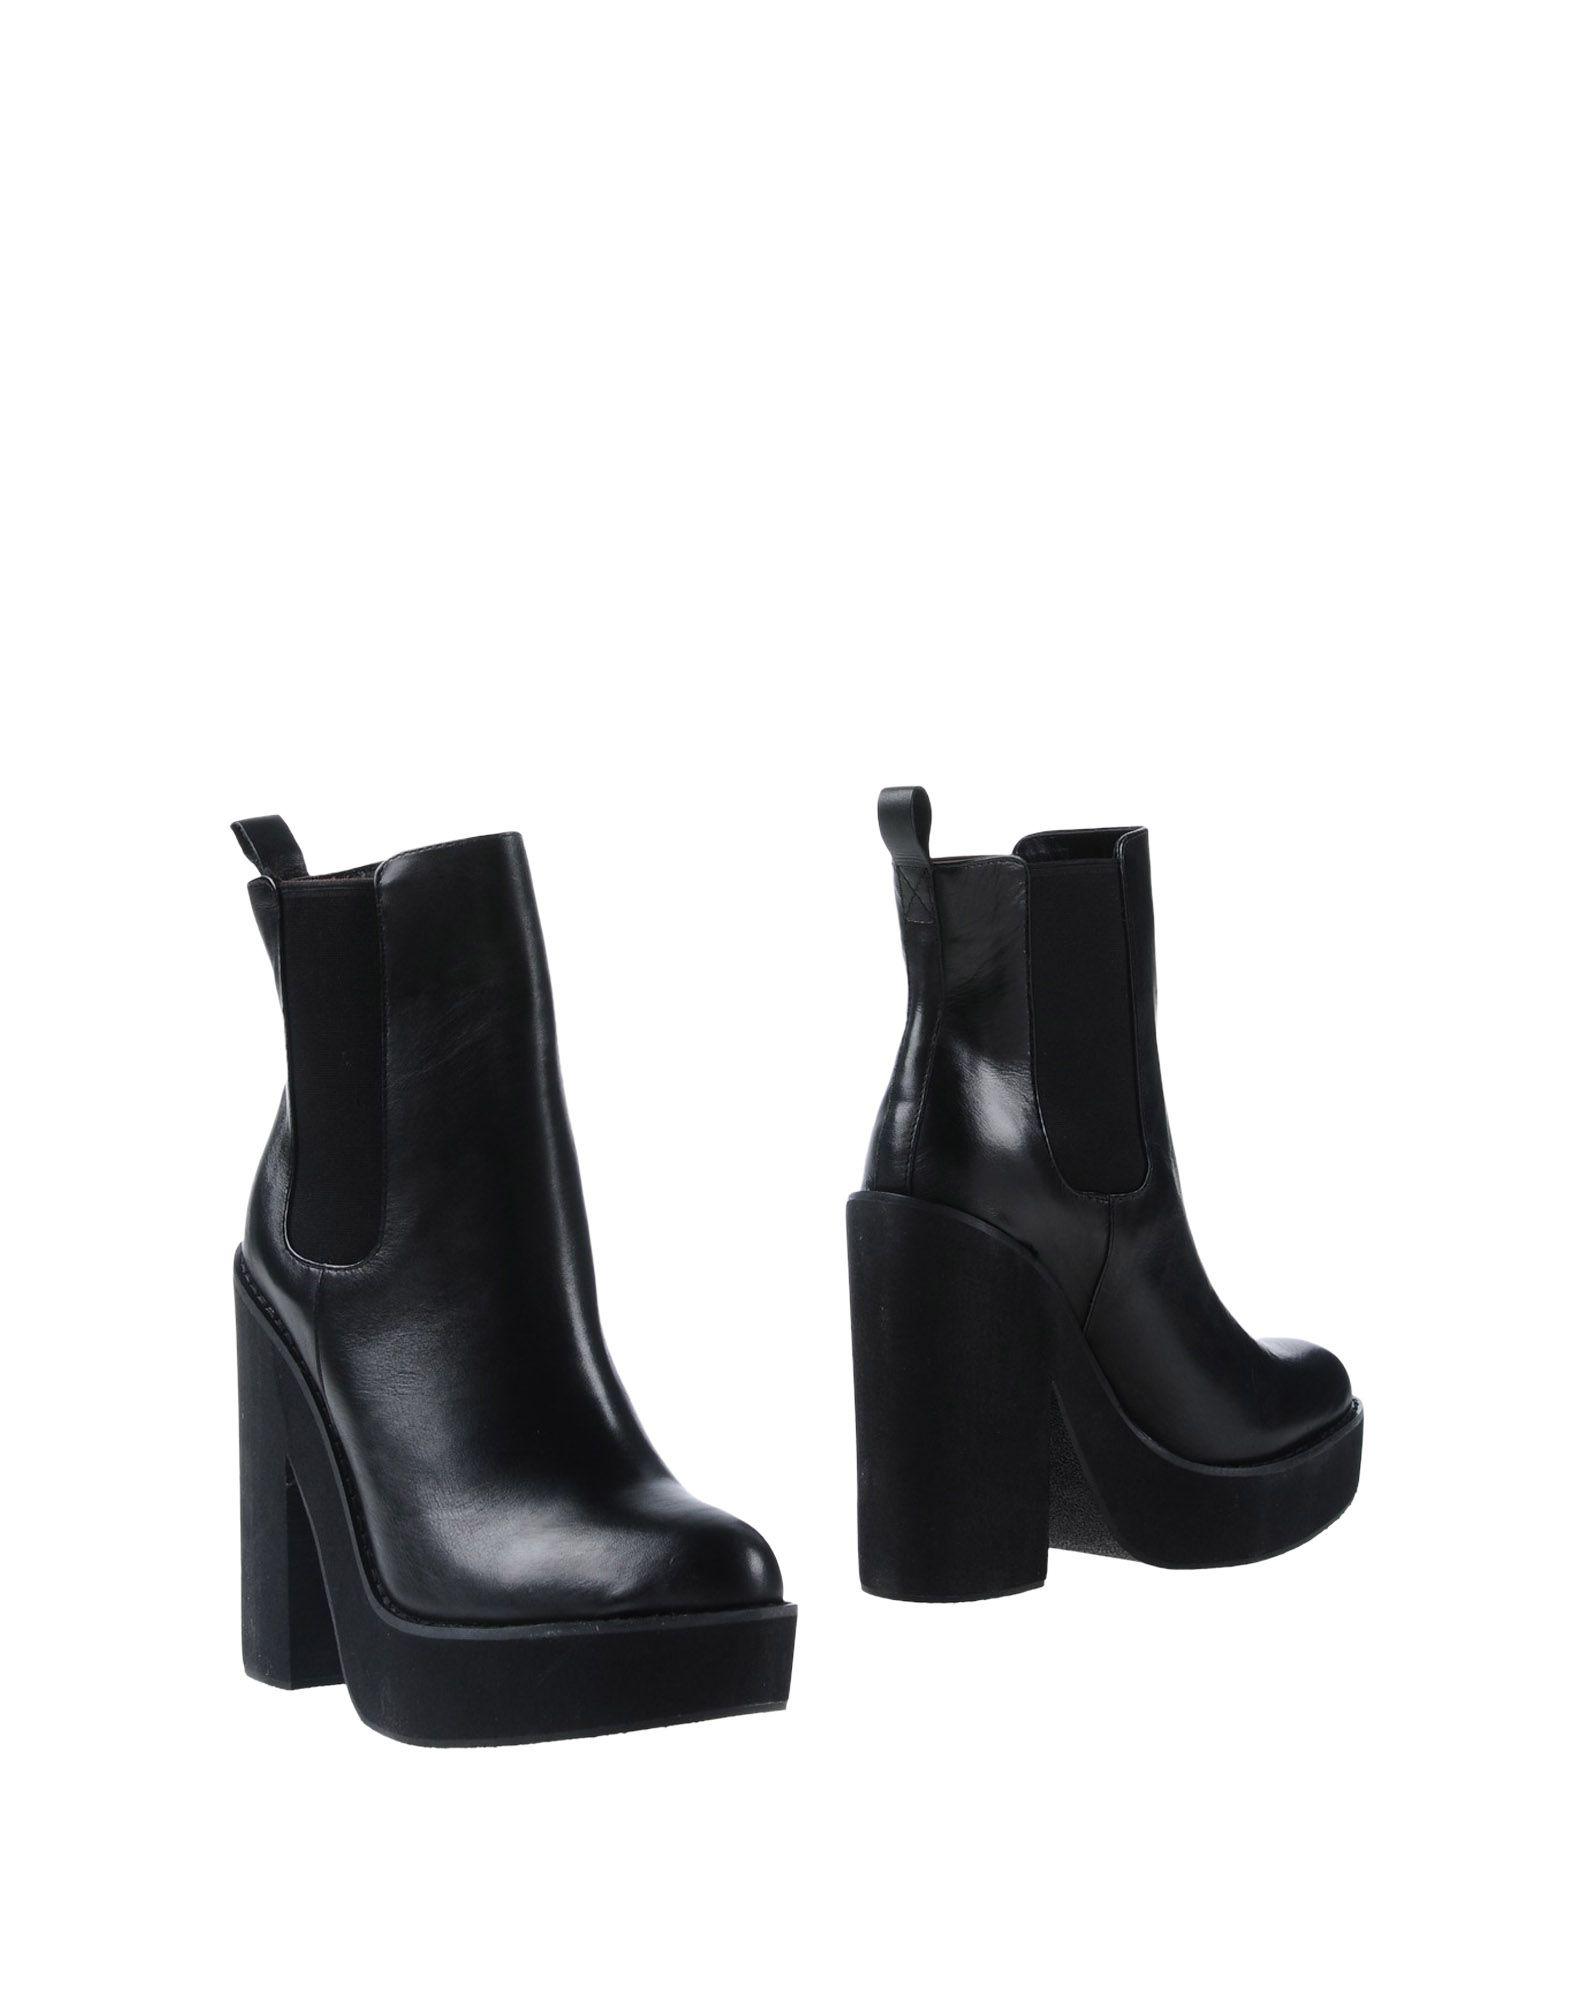 Windsor Smith Chelsea Boots Damen  11337553JJ Gute Qualität beliebte Schuhe